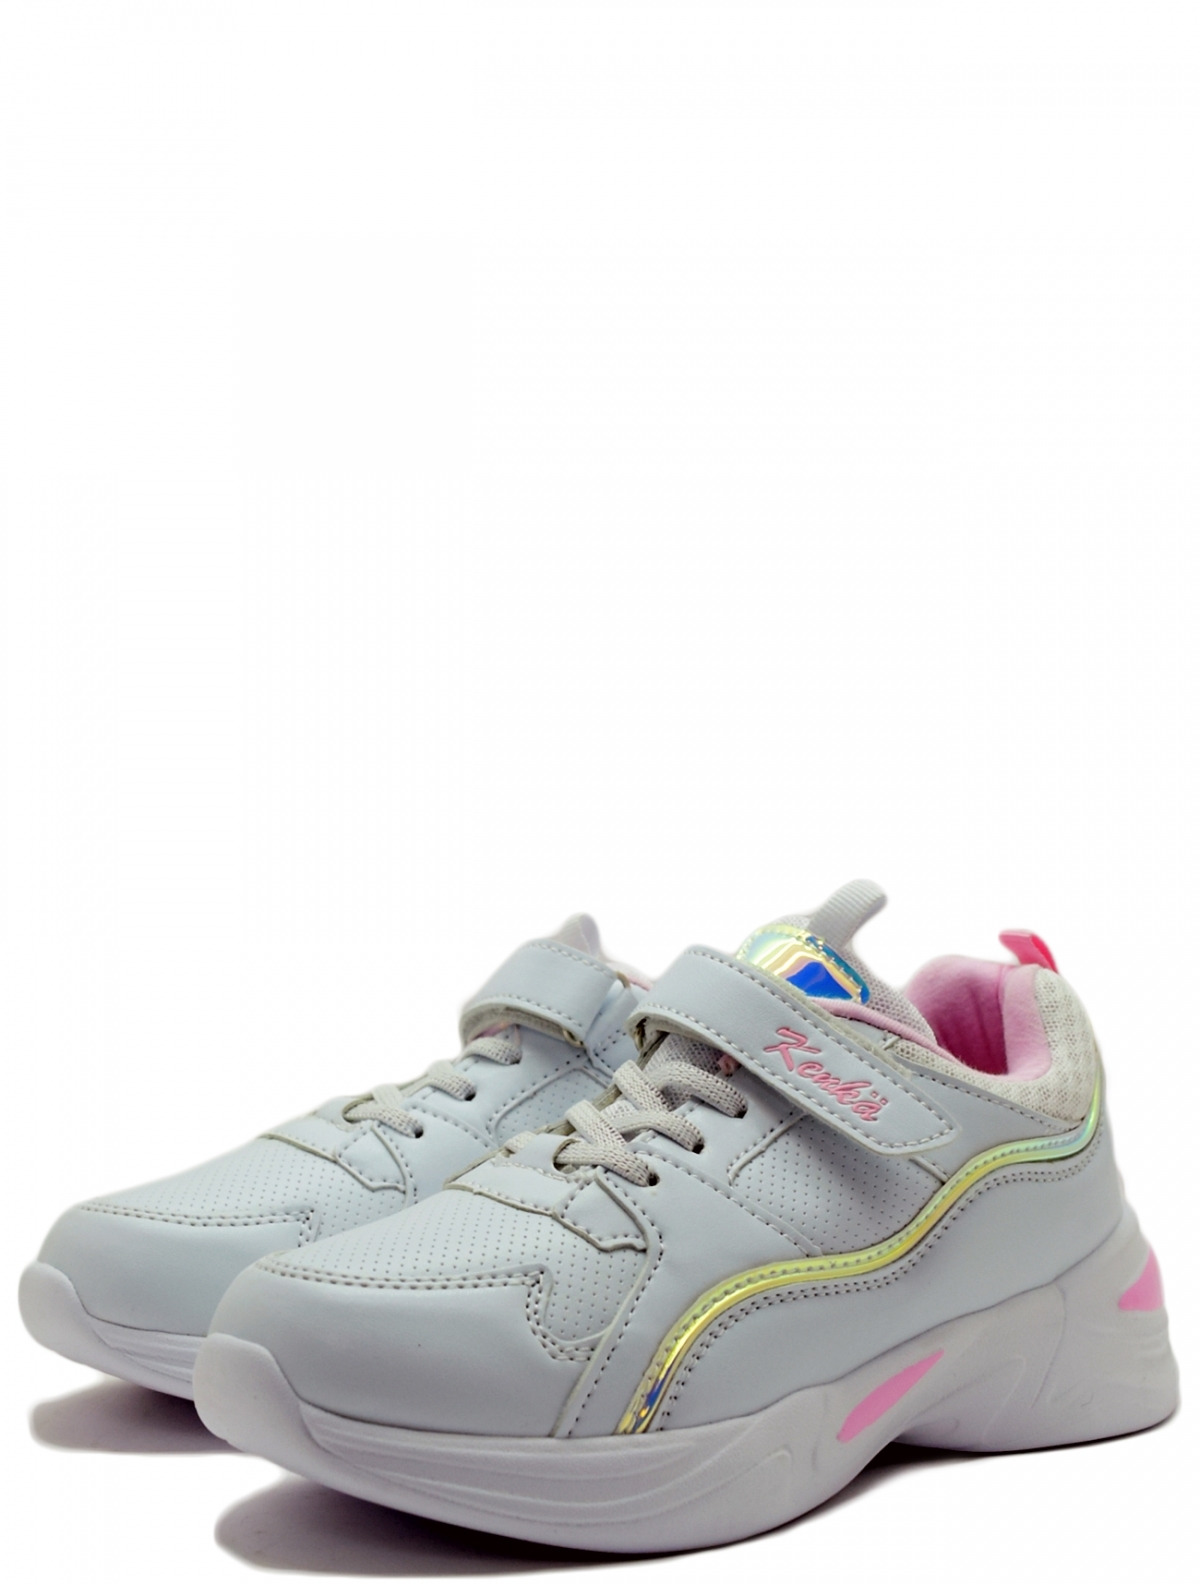 Kenka VXH-90113 кроссовки для девочки